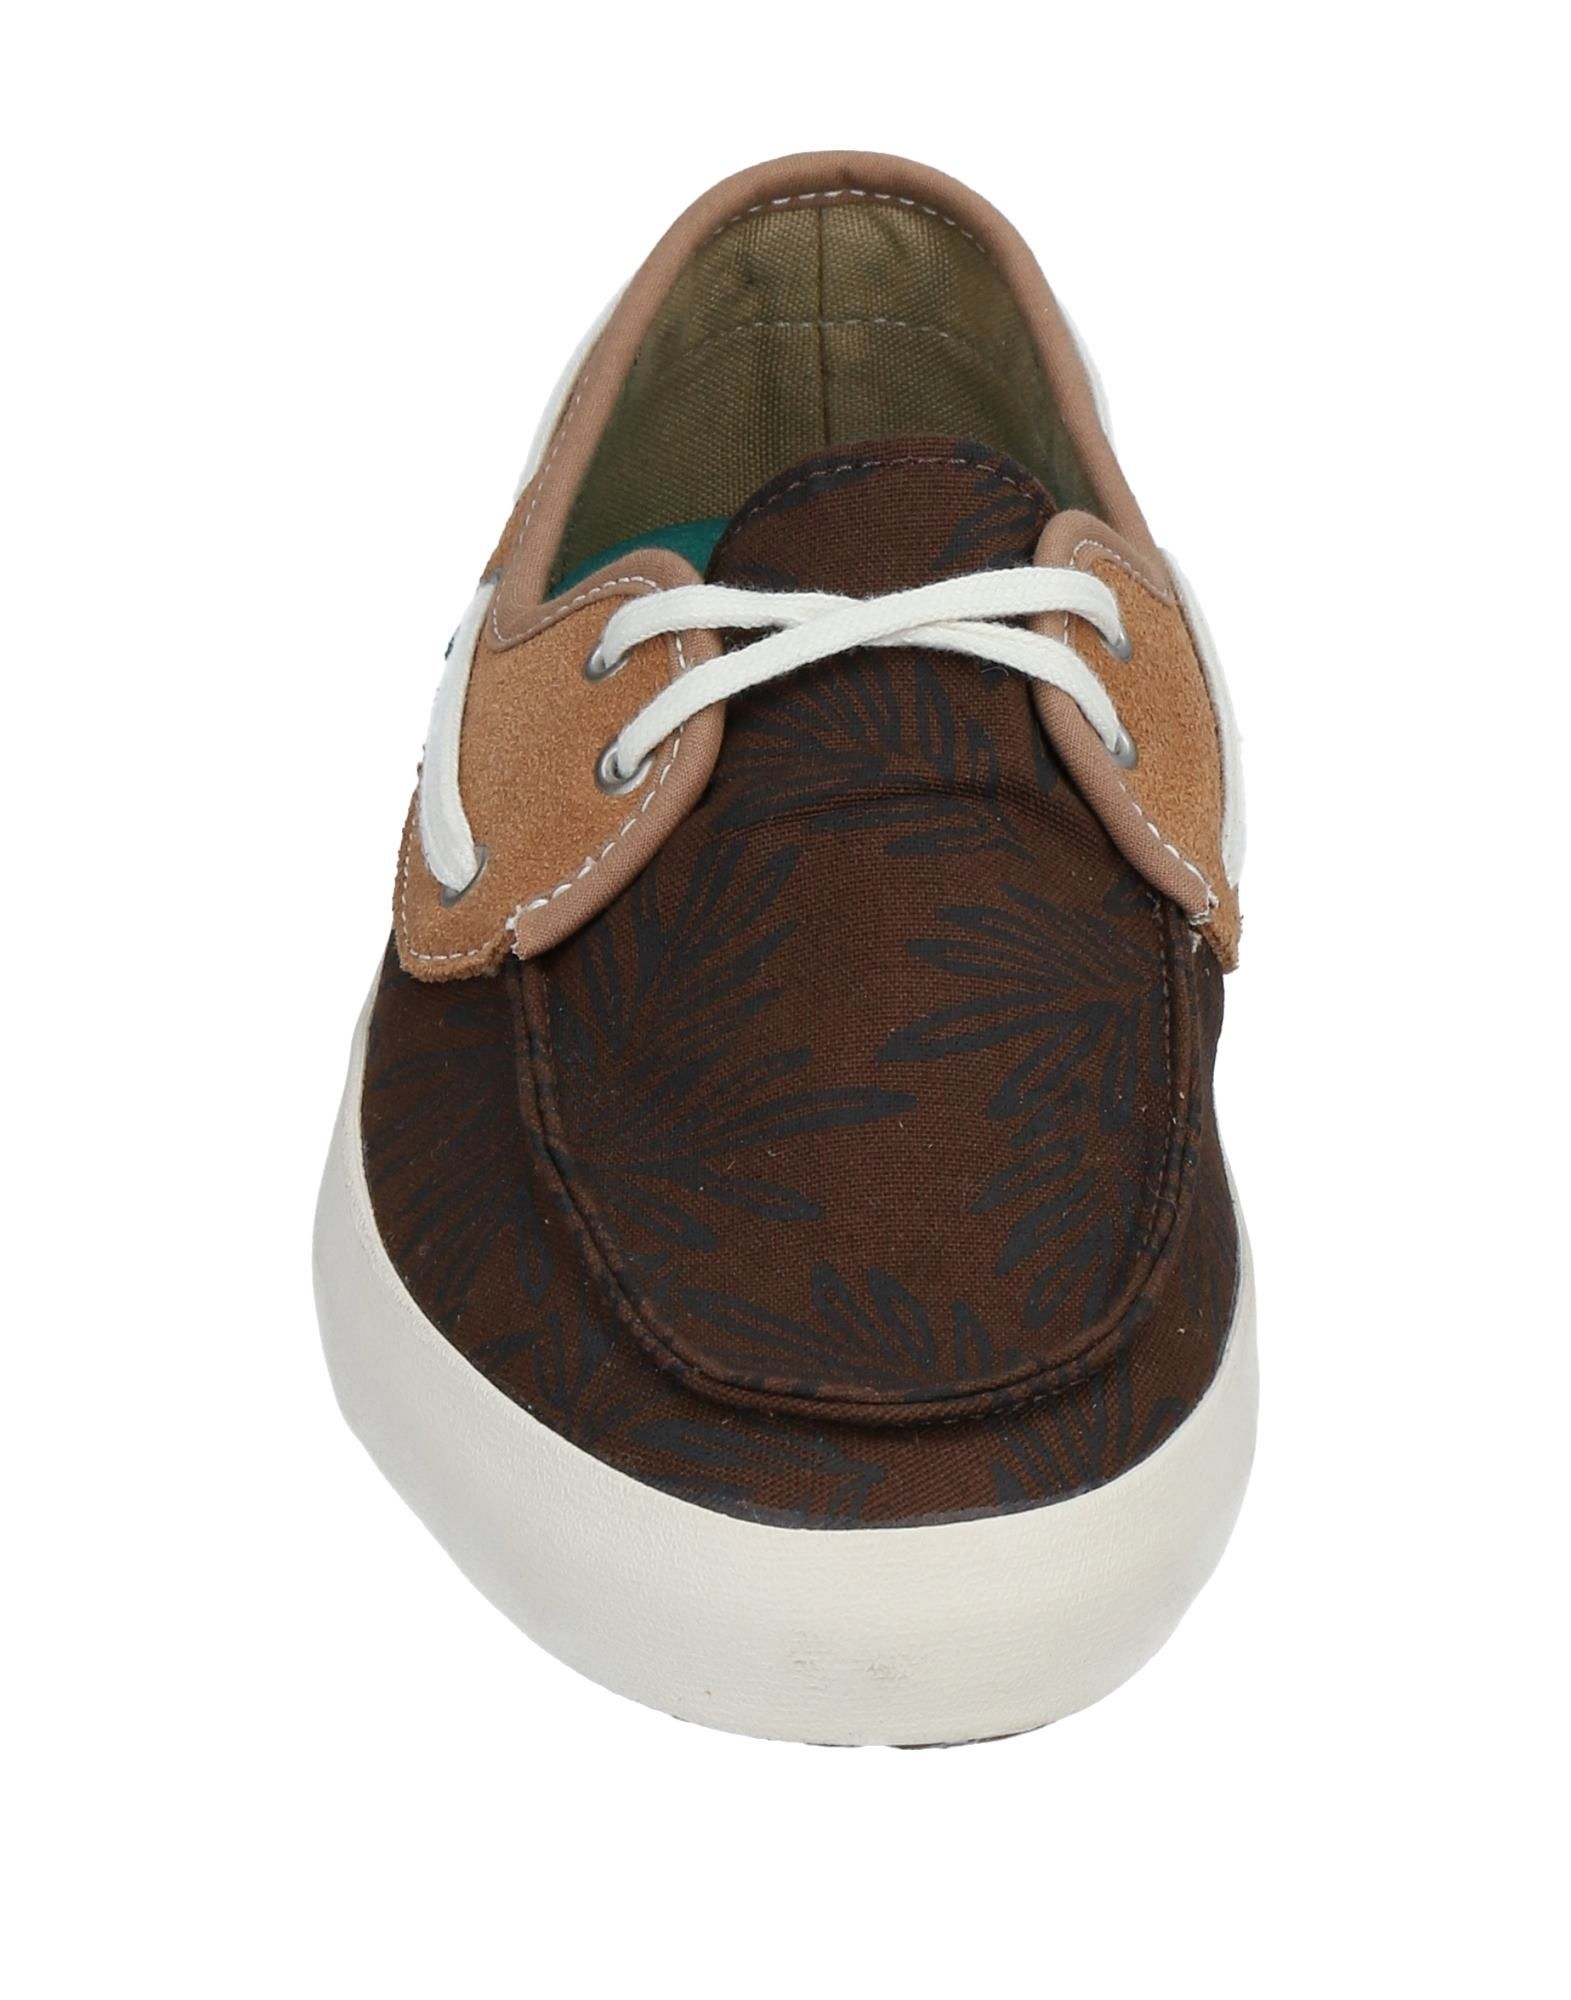 The Original Surf Siders By Vans Sneakers Damen    11535008GG Gute Qualität beliebte Schuhe fbf315